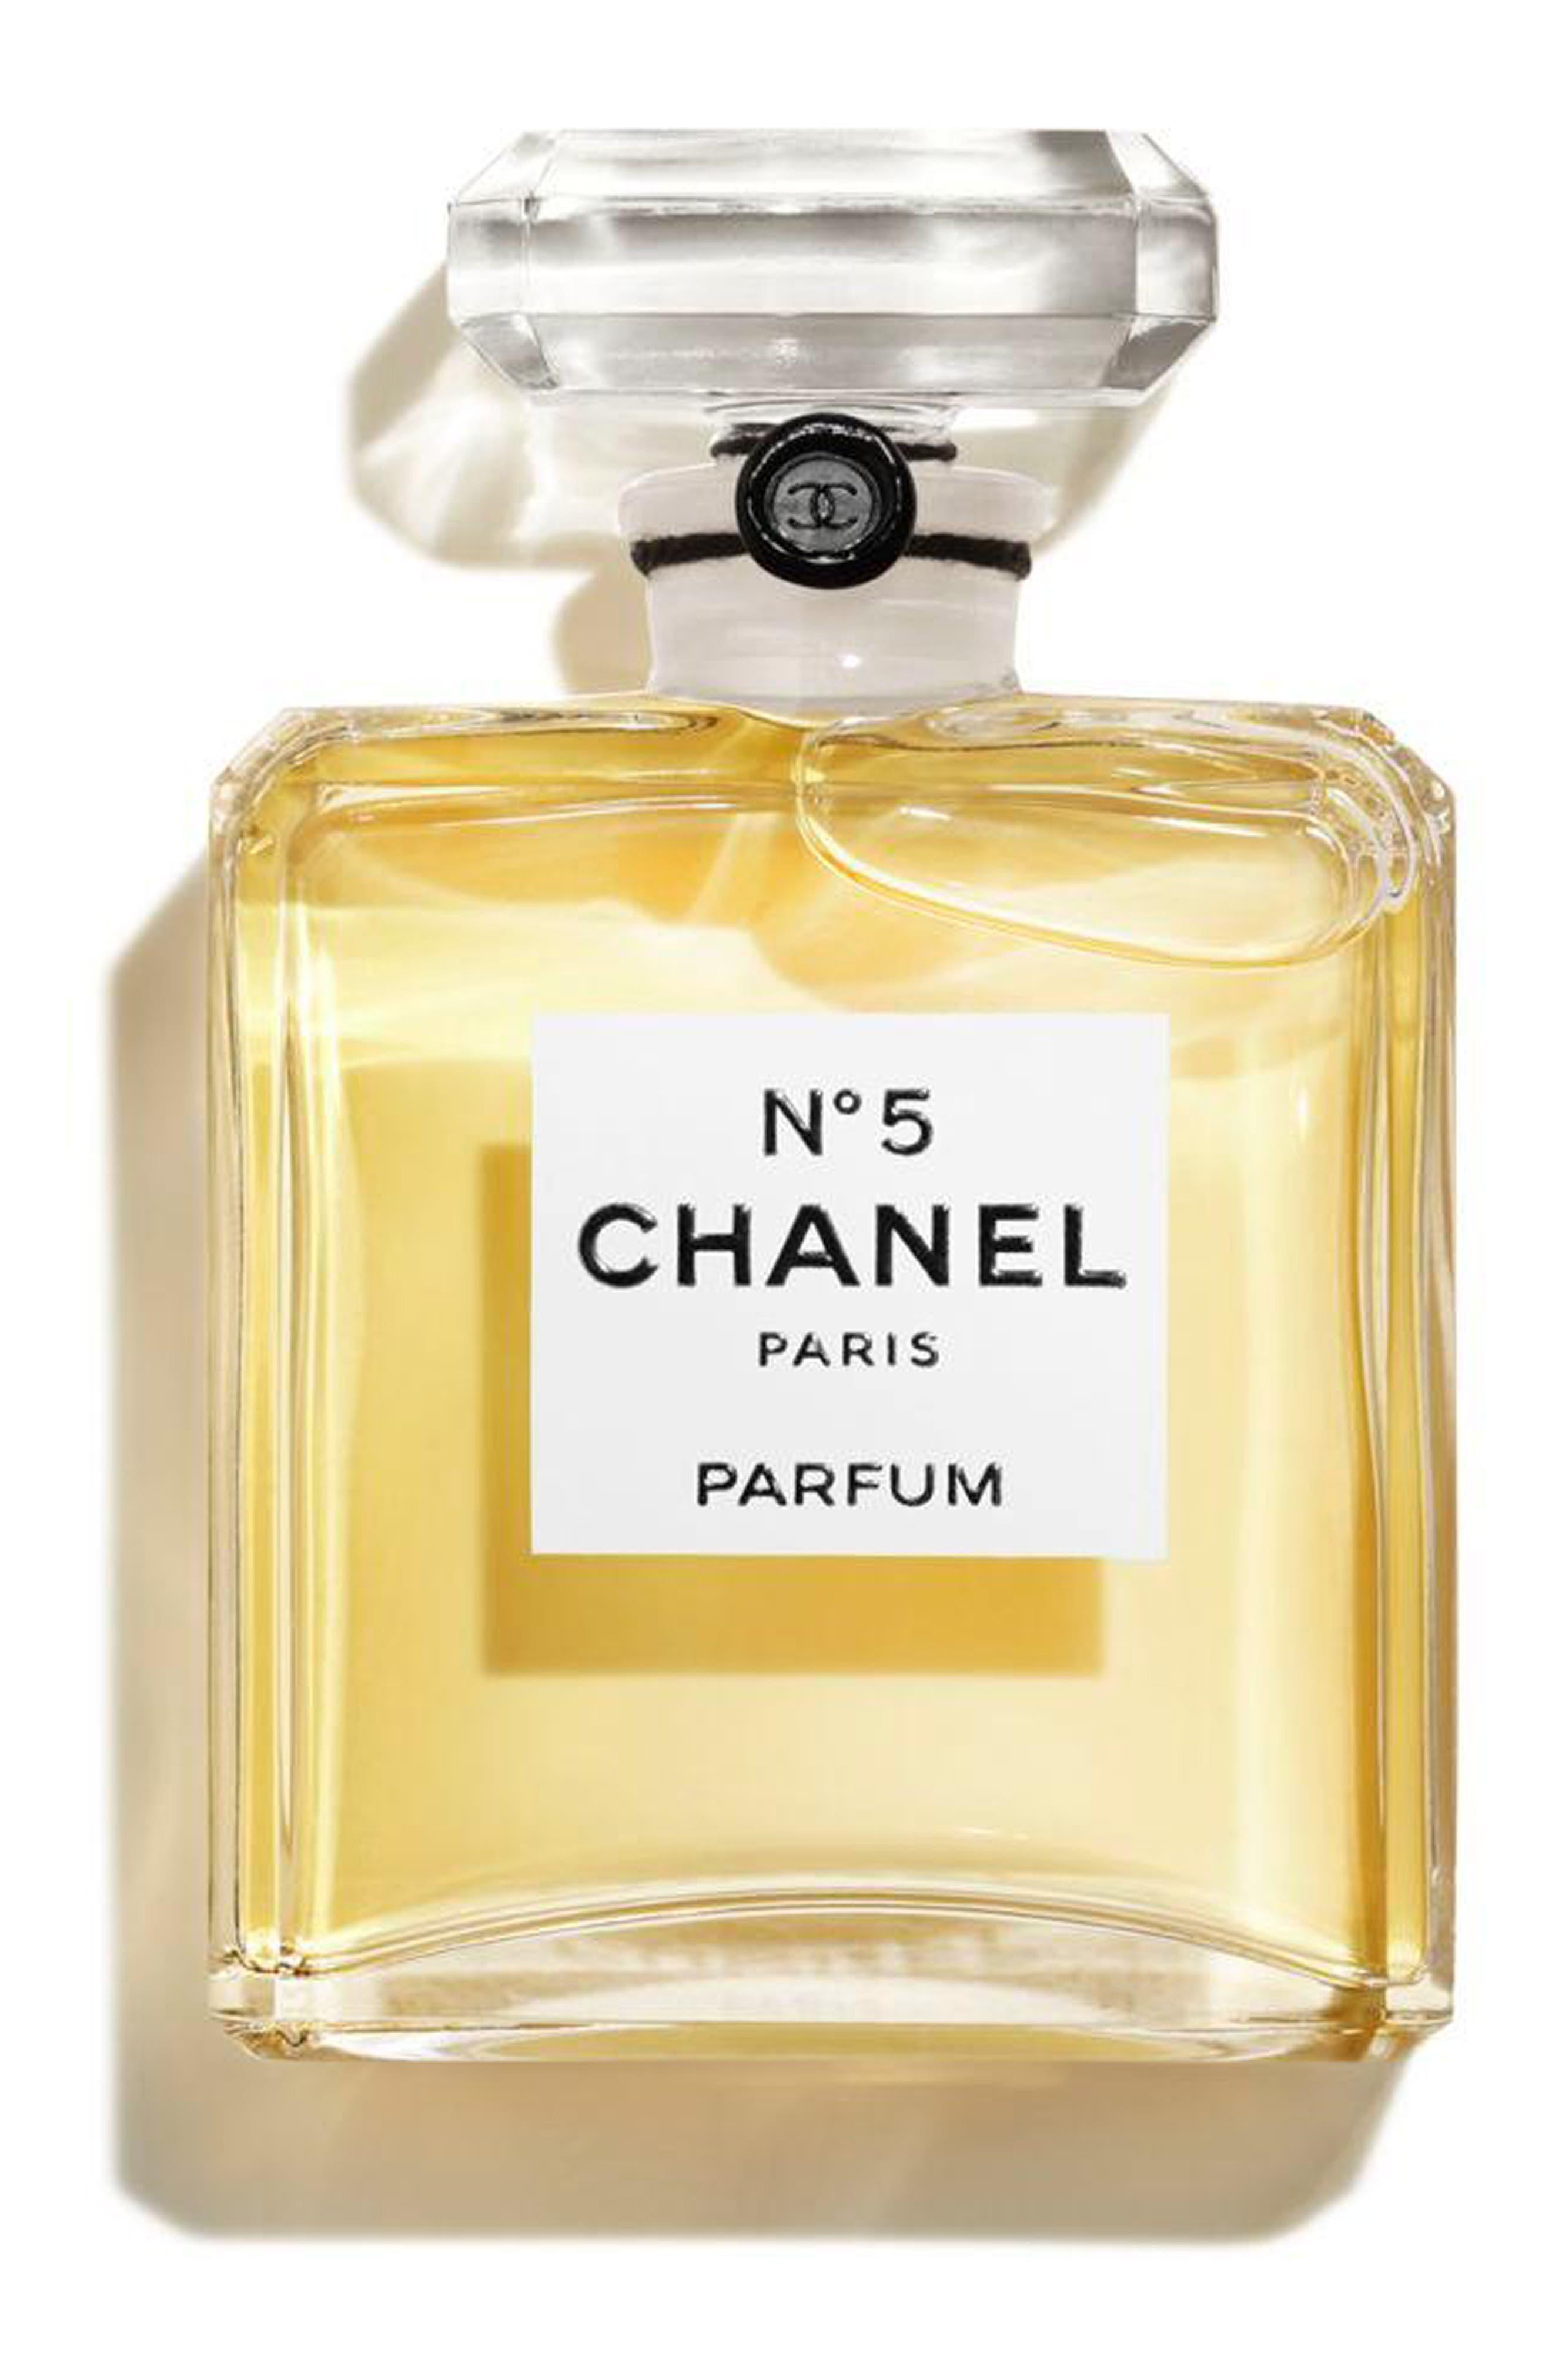 CHANEL N°5 Parfum | Nordstrom